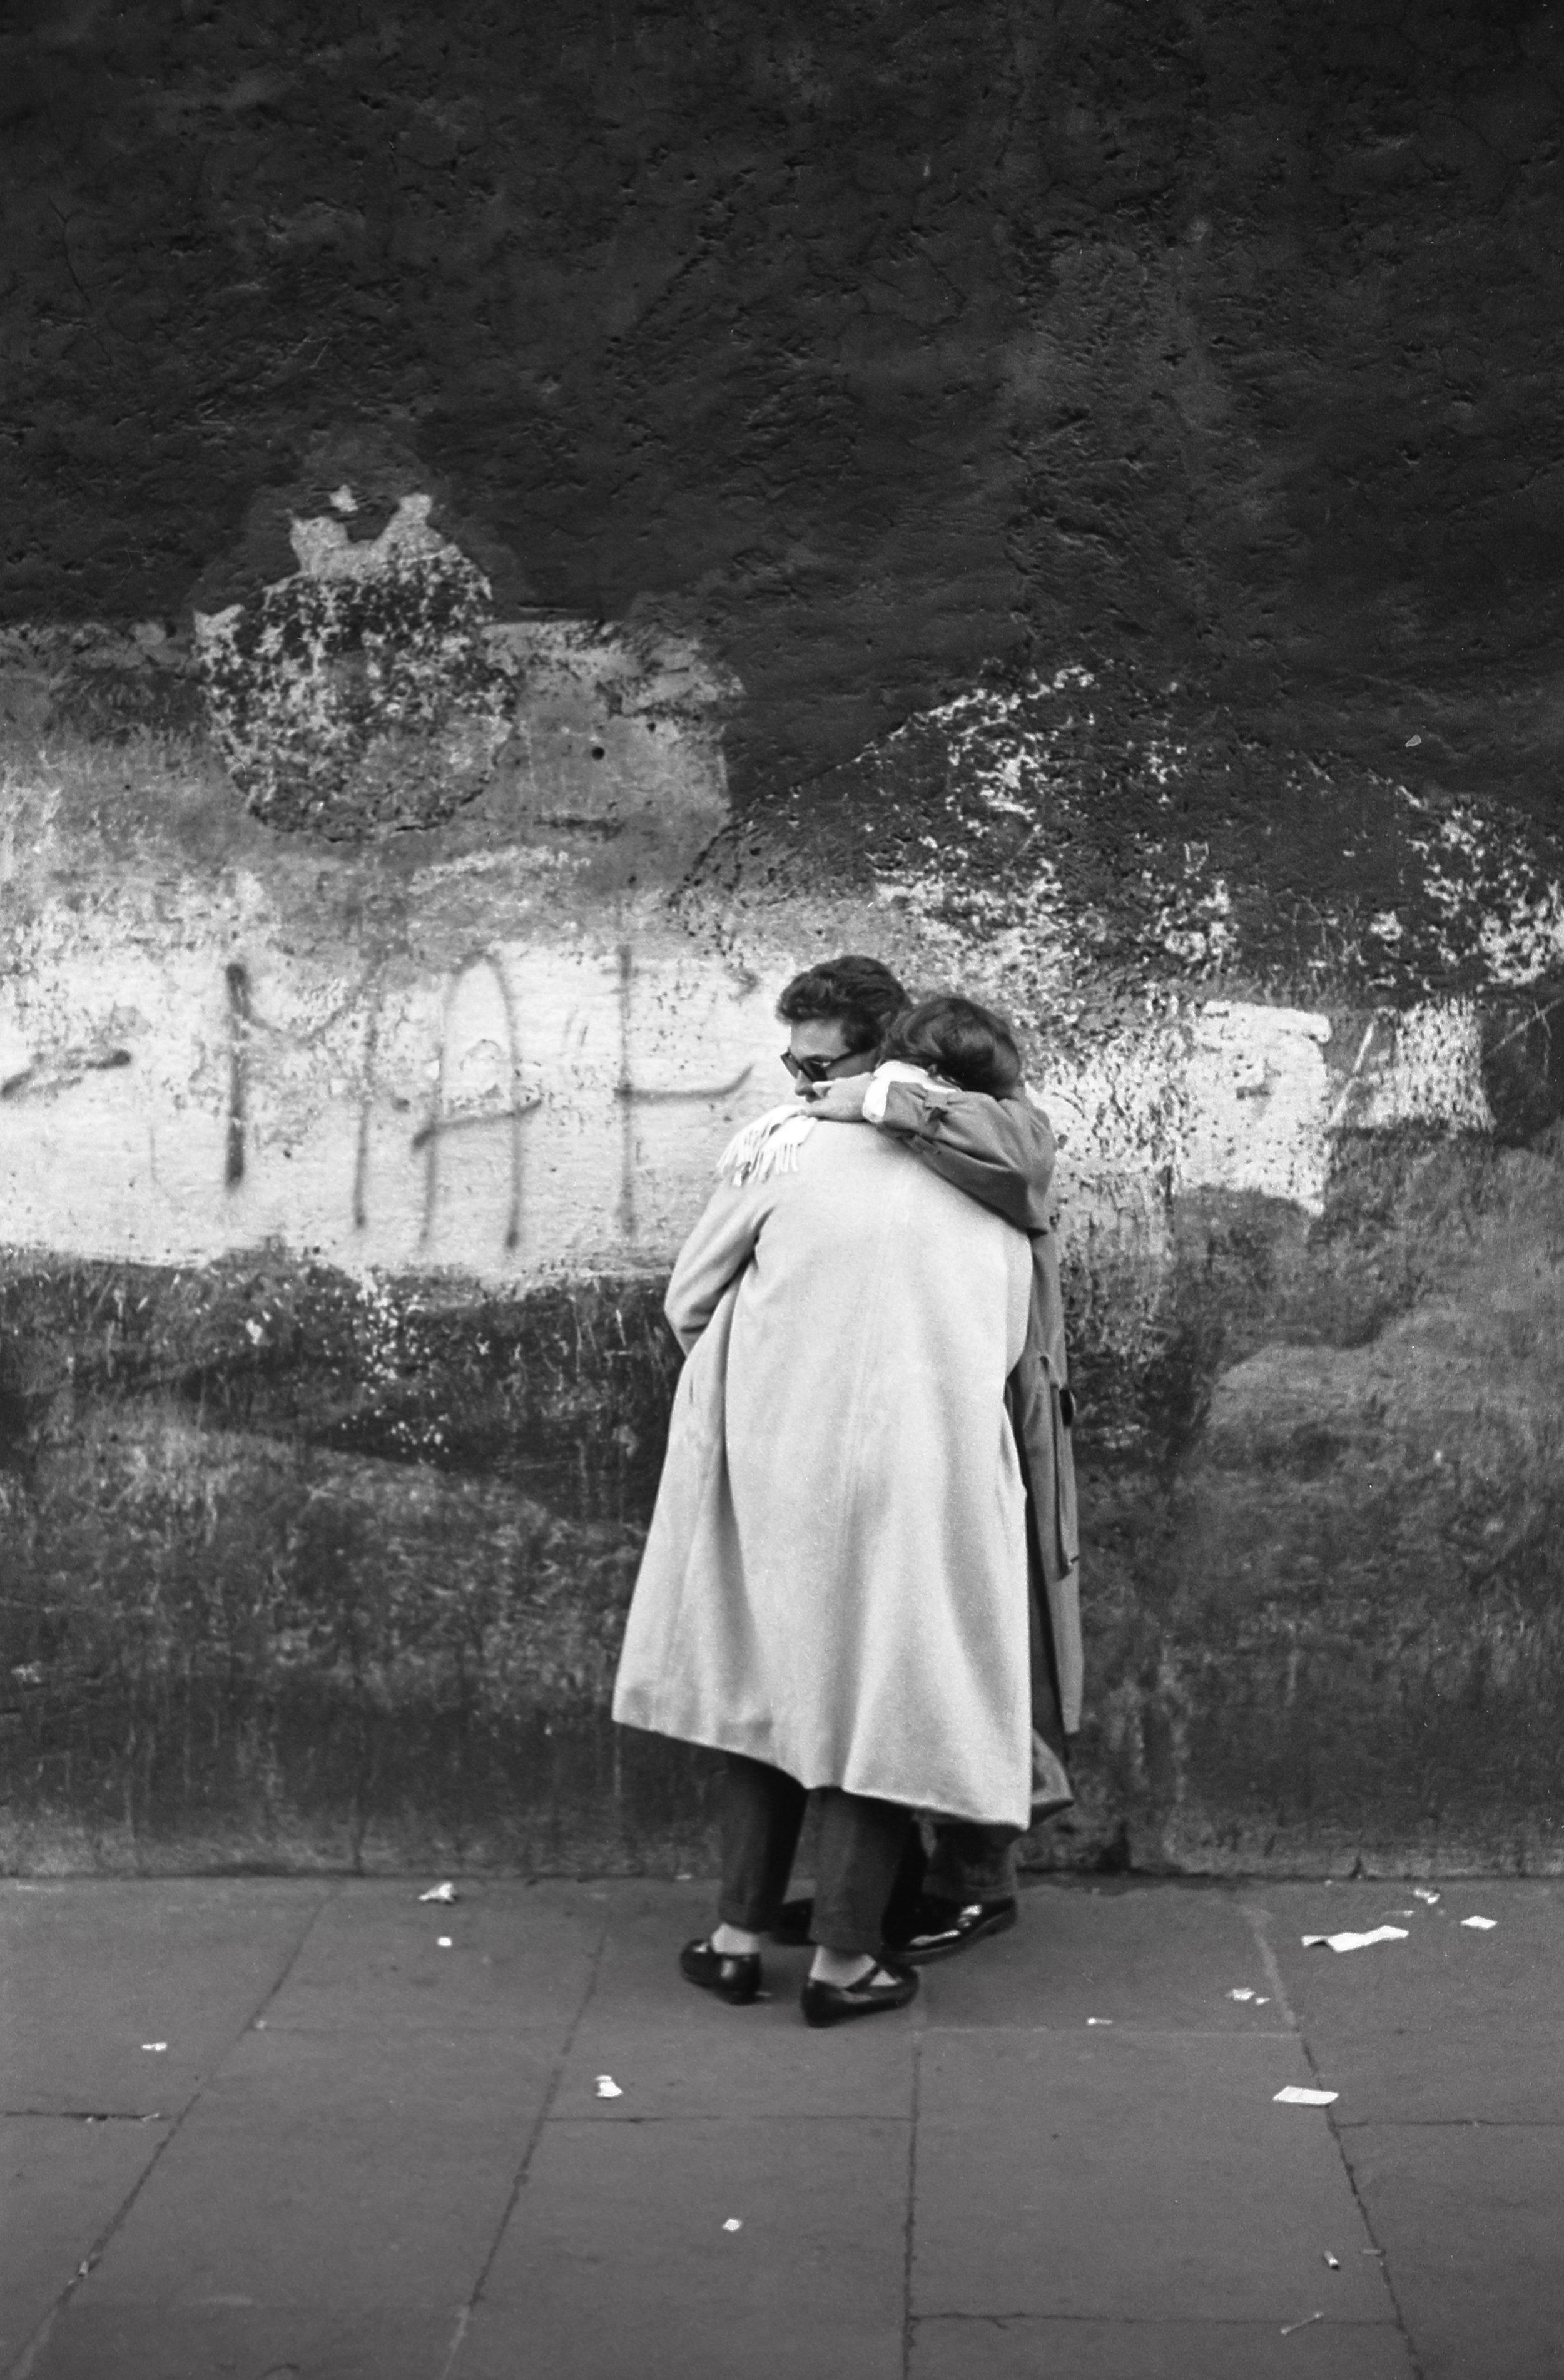 L'étreinte, Rome 1984